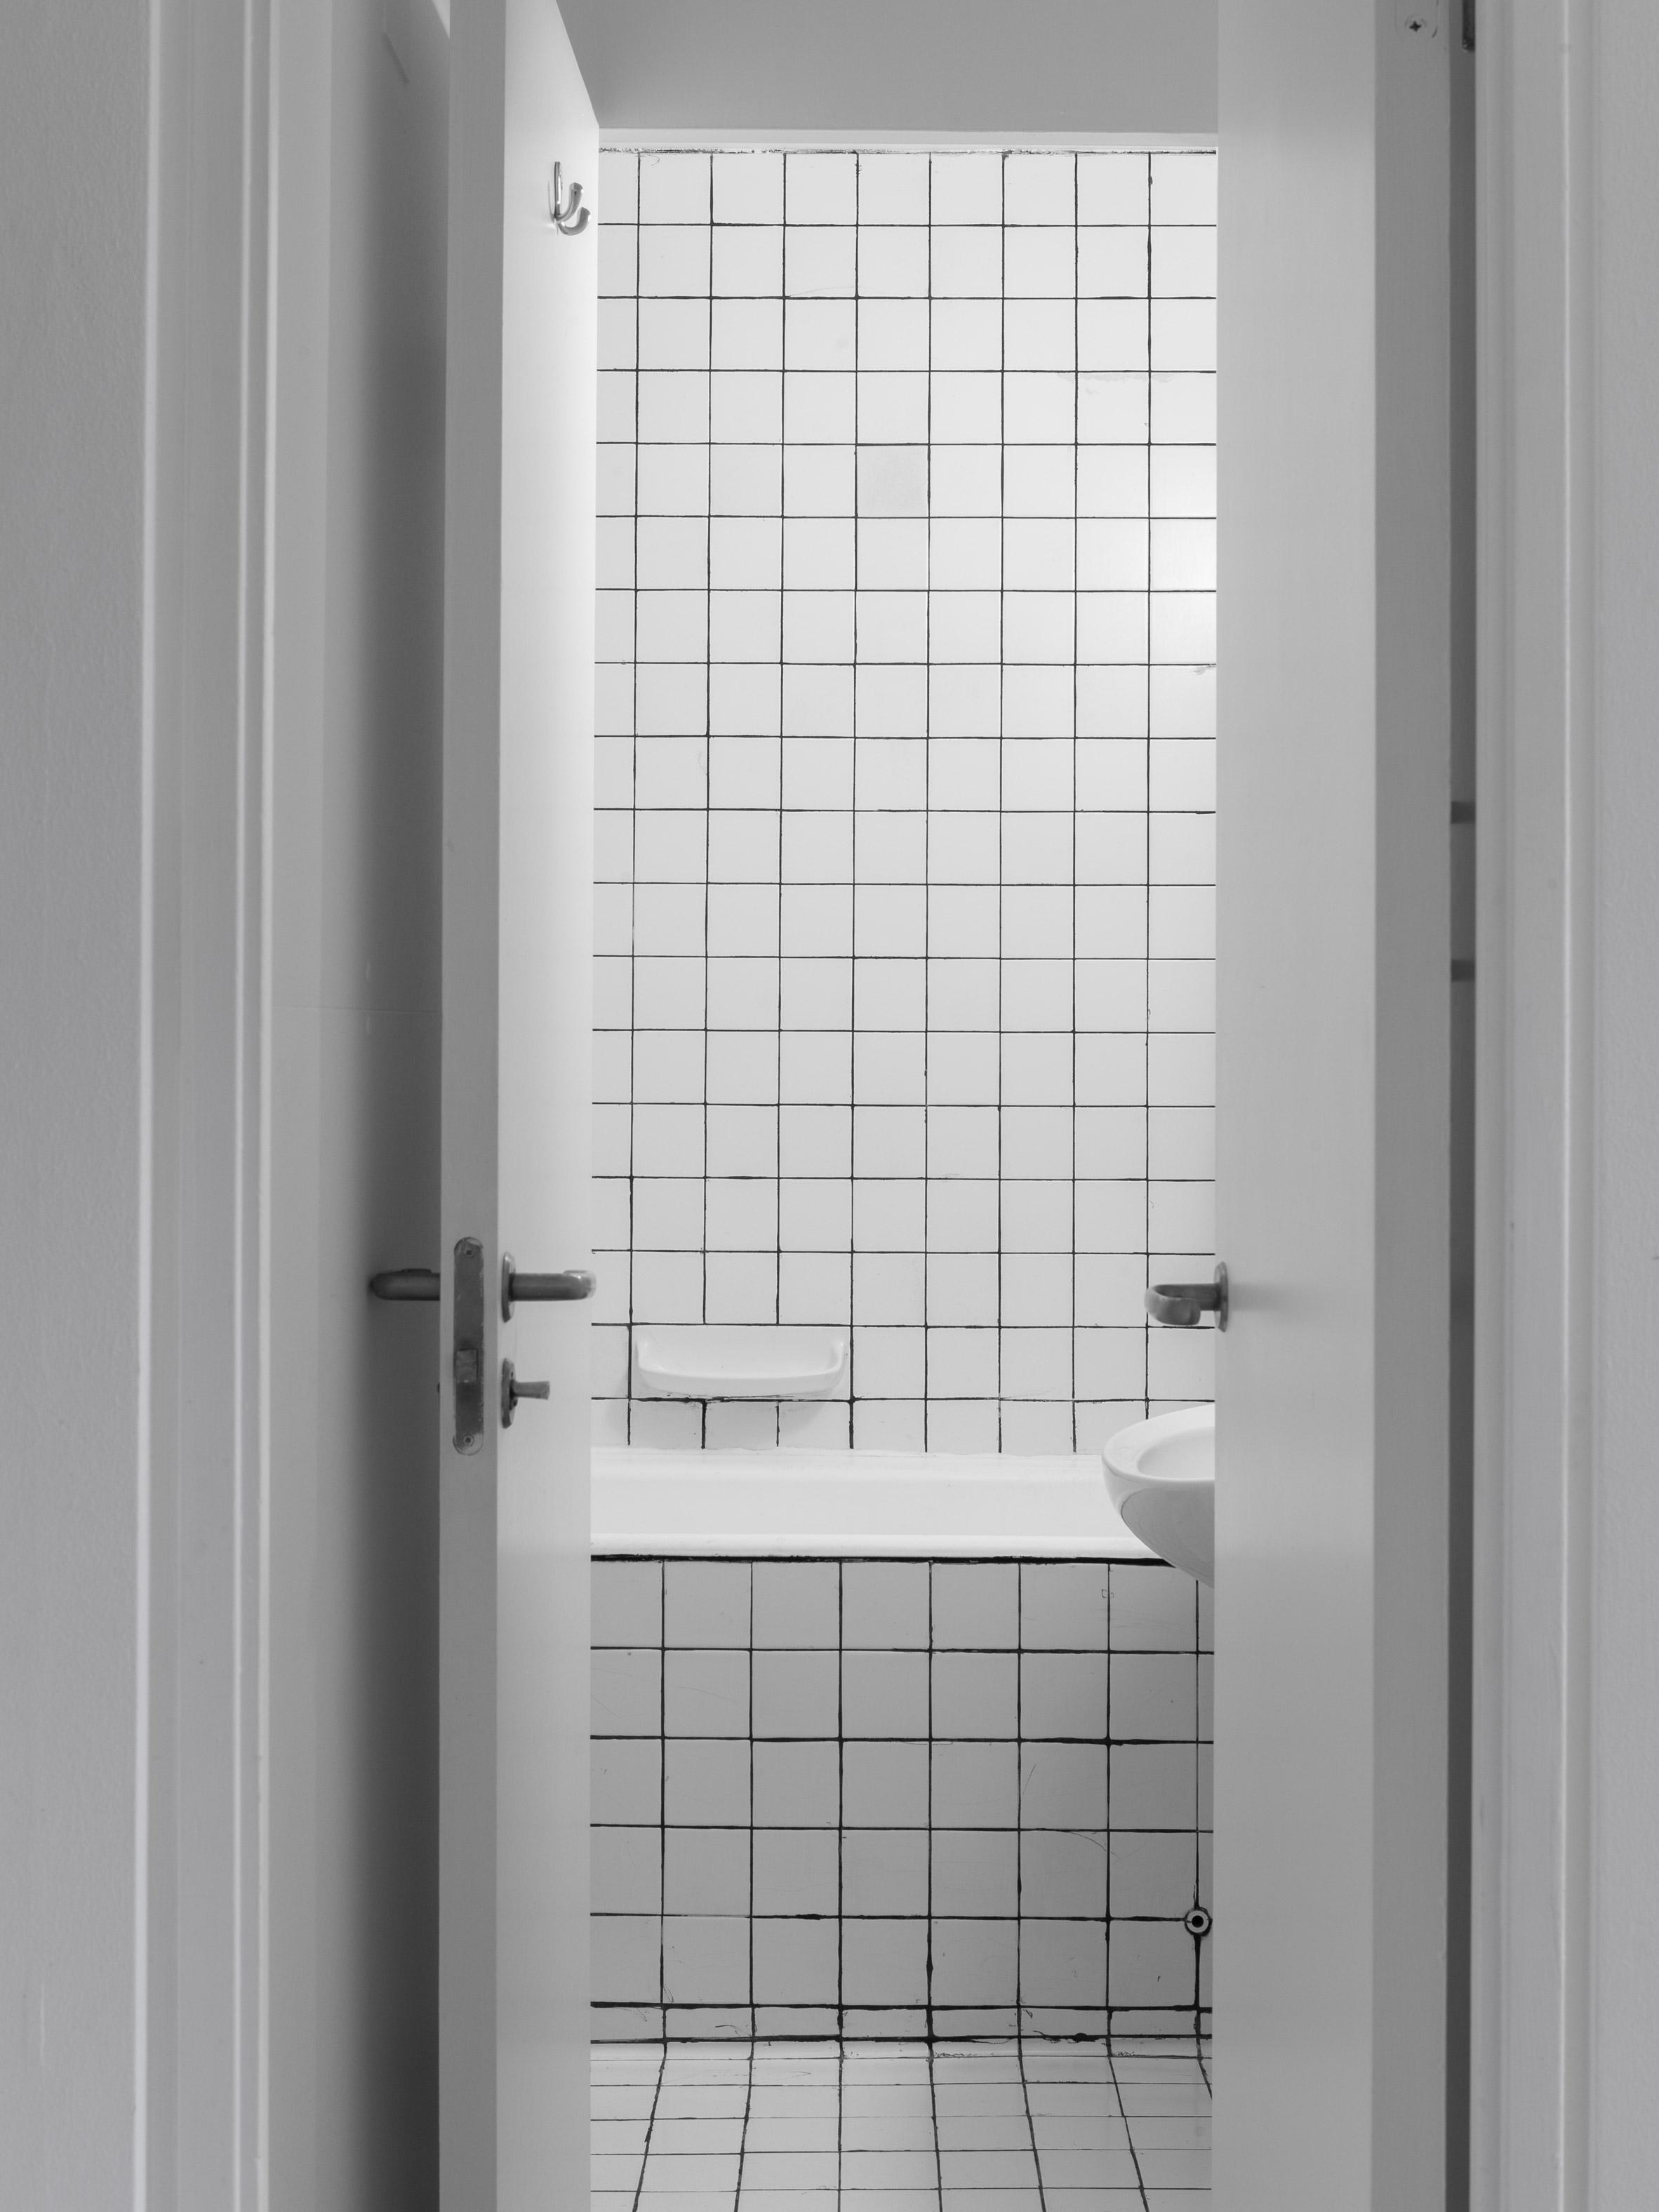 Barbican Dancer's Studio by Intervention Architecture bathroom